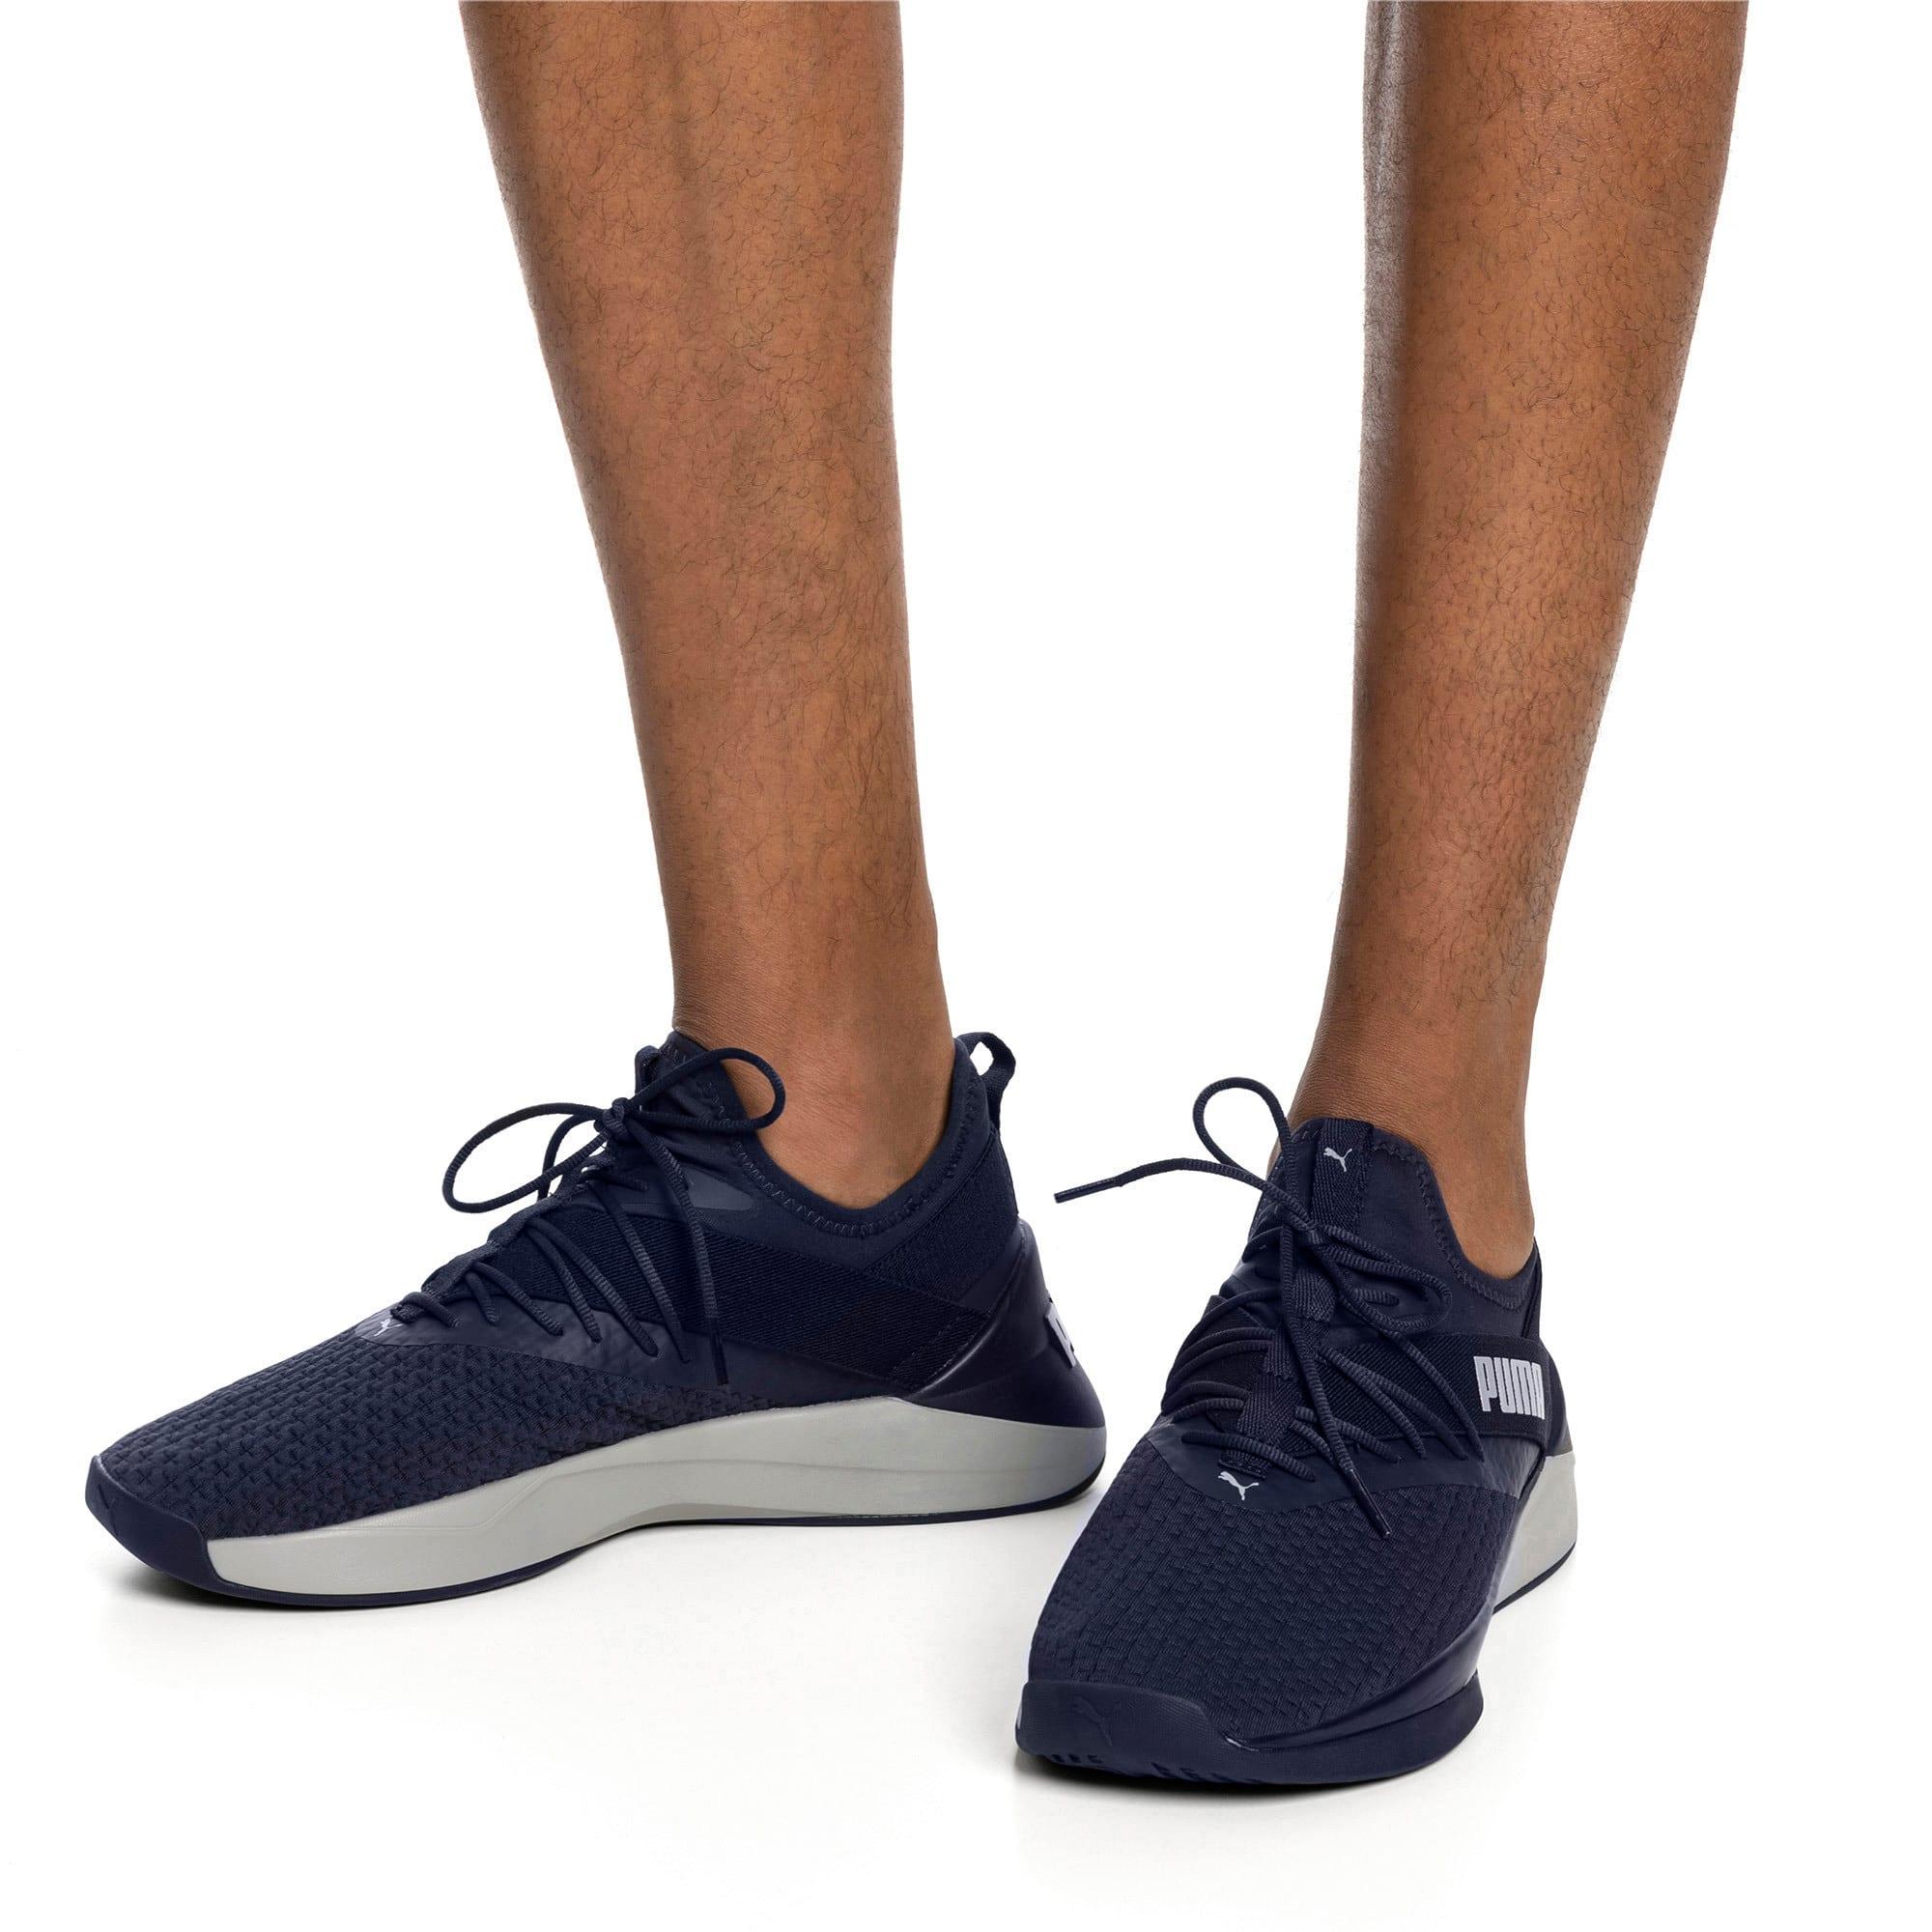 Thumbnail 7 of Jaab XT Men's Training Shoes, Peacoat-Quarry, medium